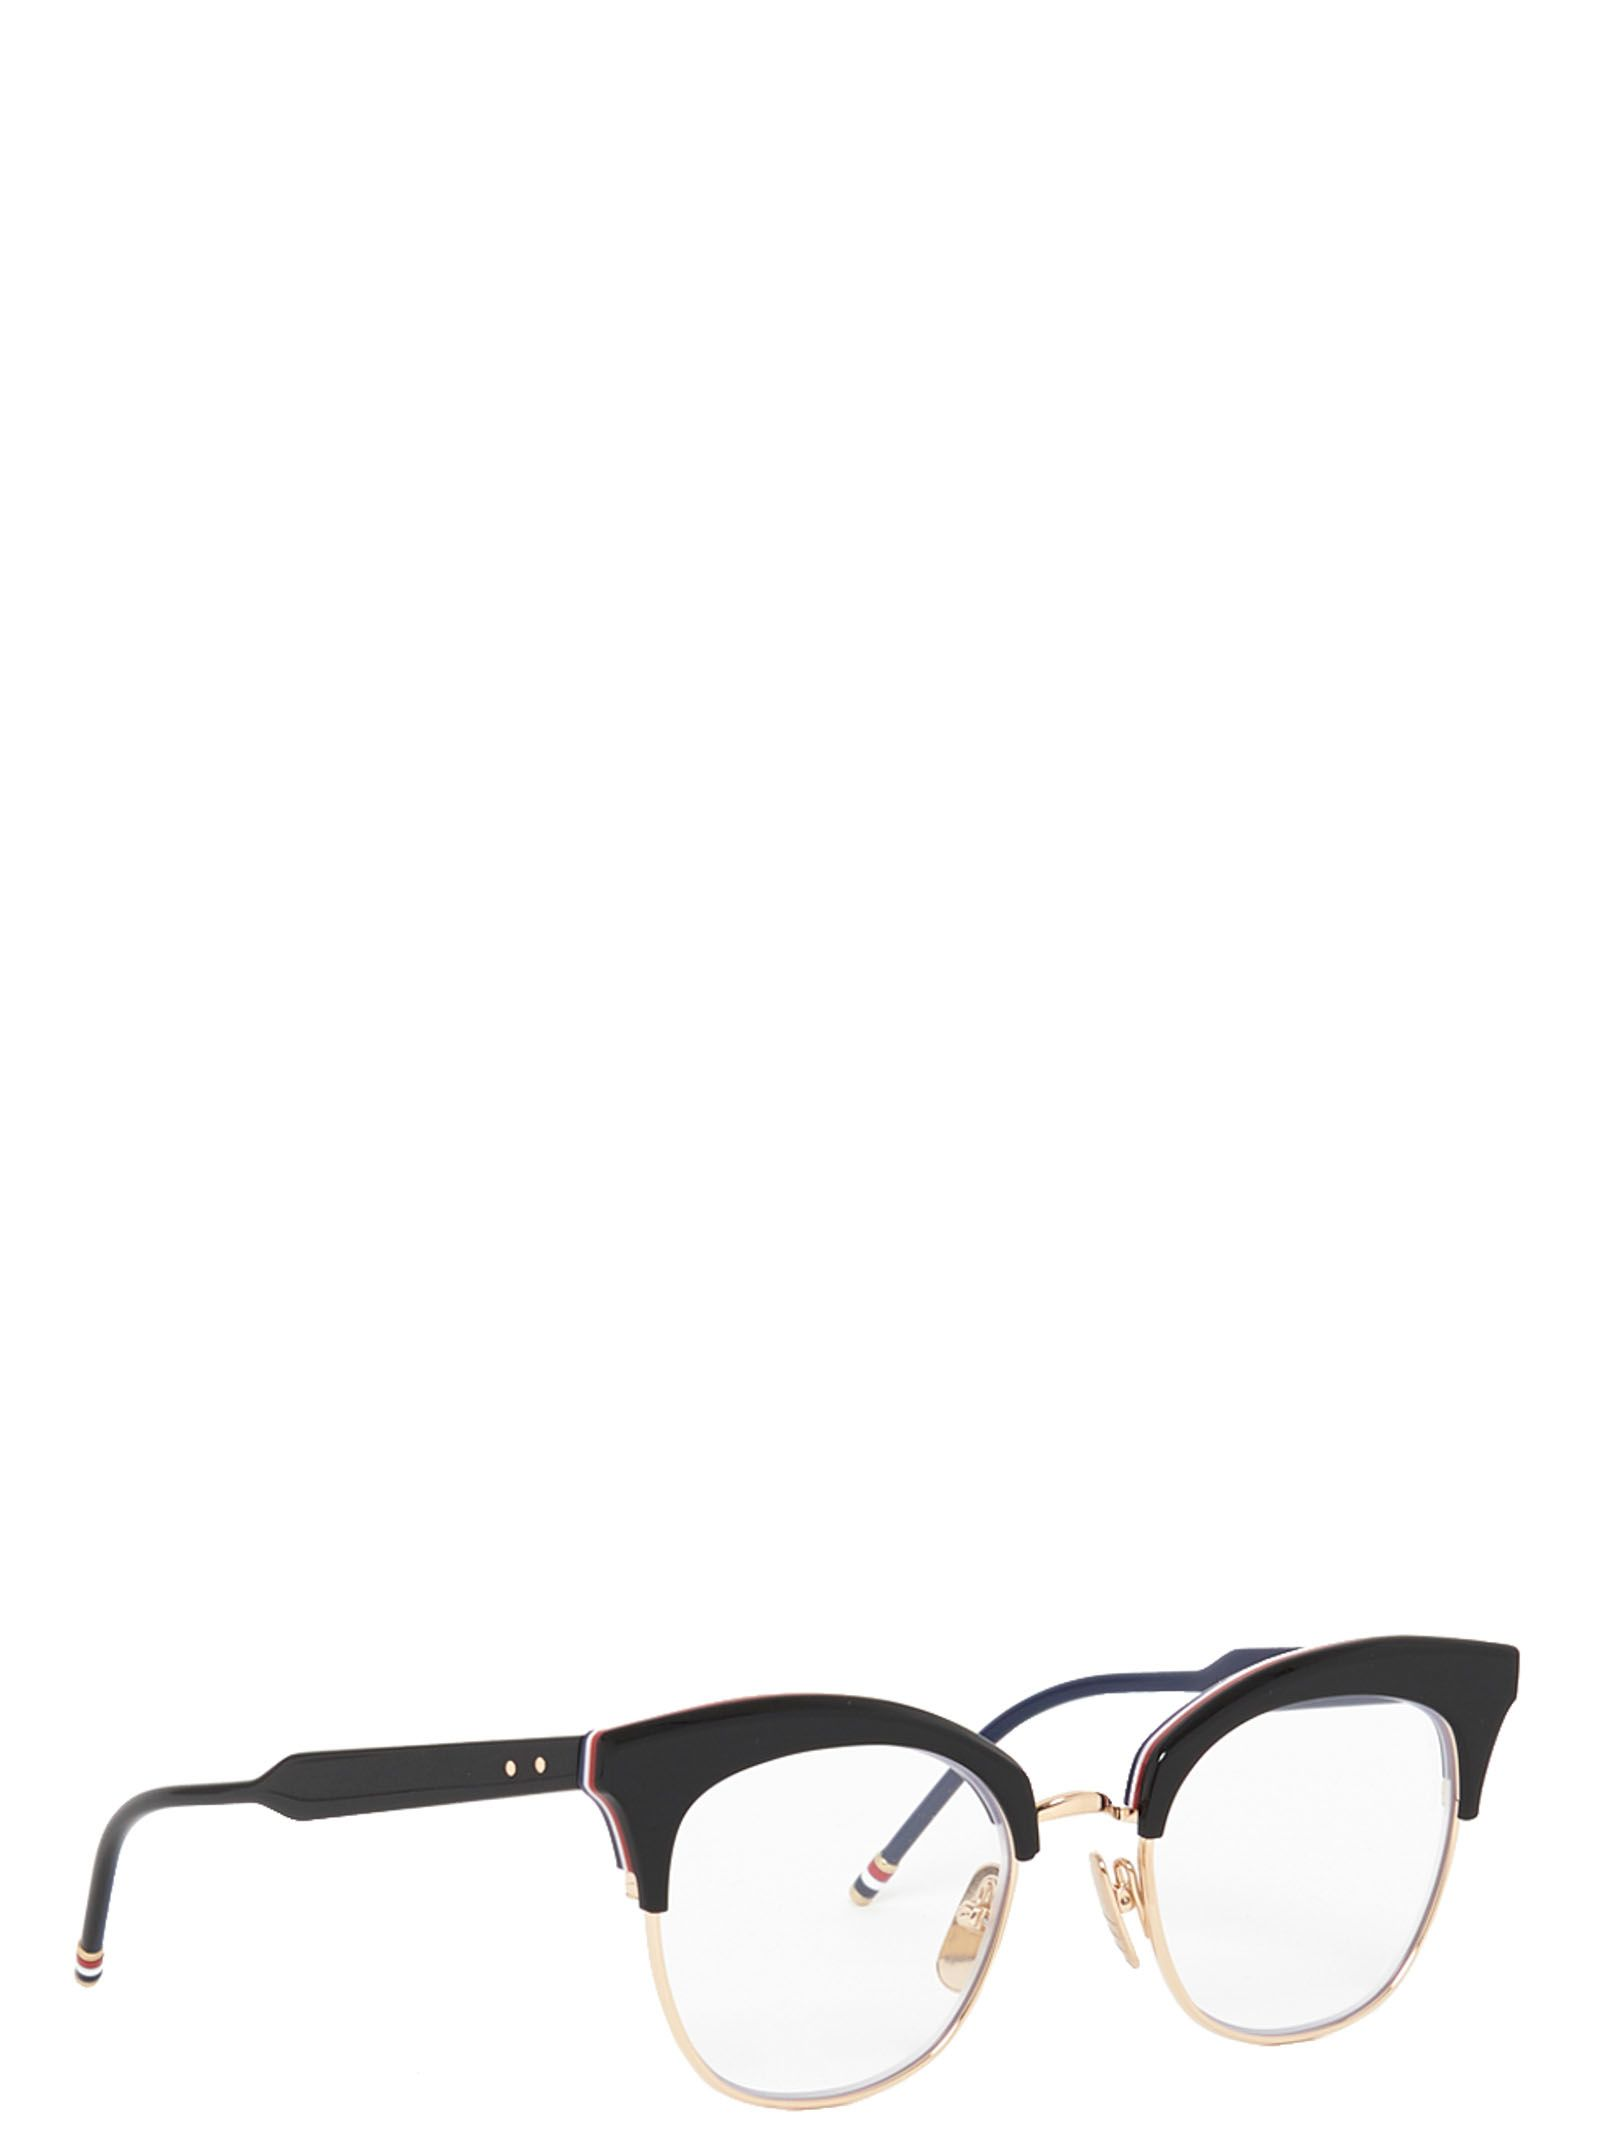 Thom Browne Glasses